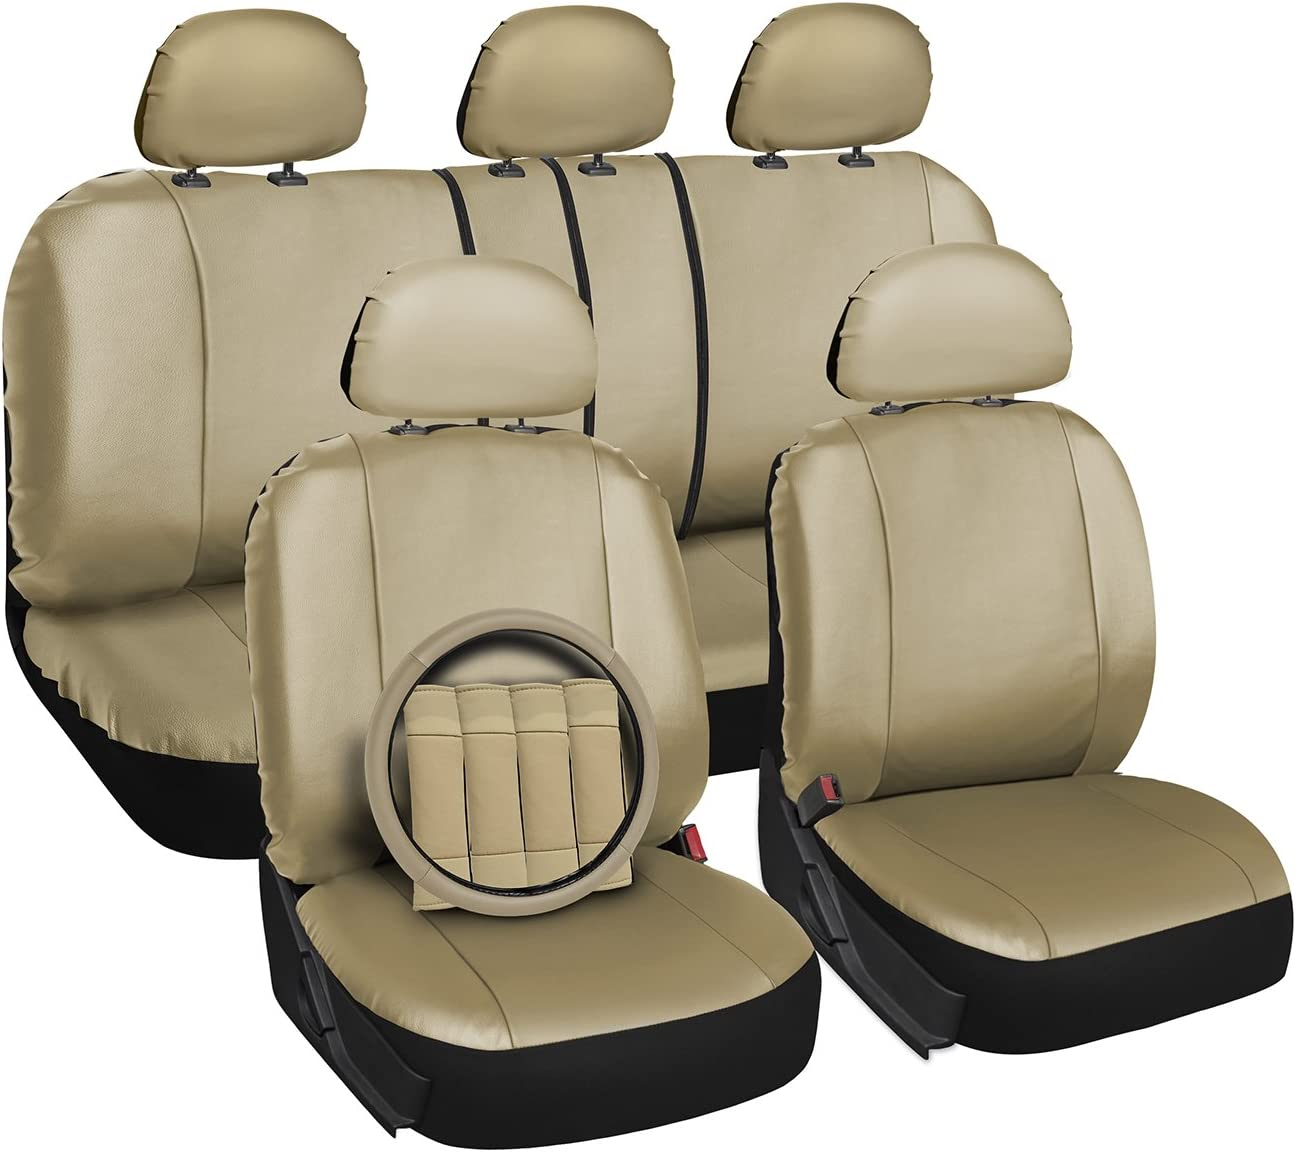 Velour Beige Covercraft Custom Fit Dash Cover for Select Hyundai Tucson Models 71888-00-23